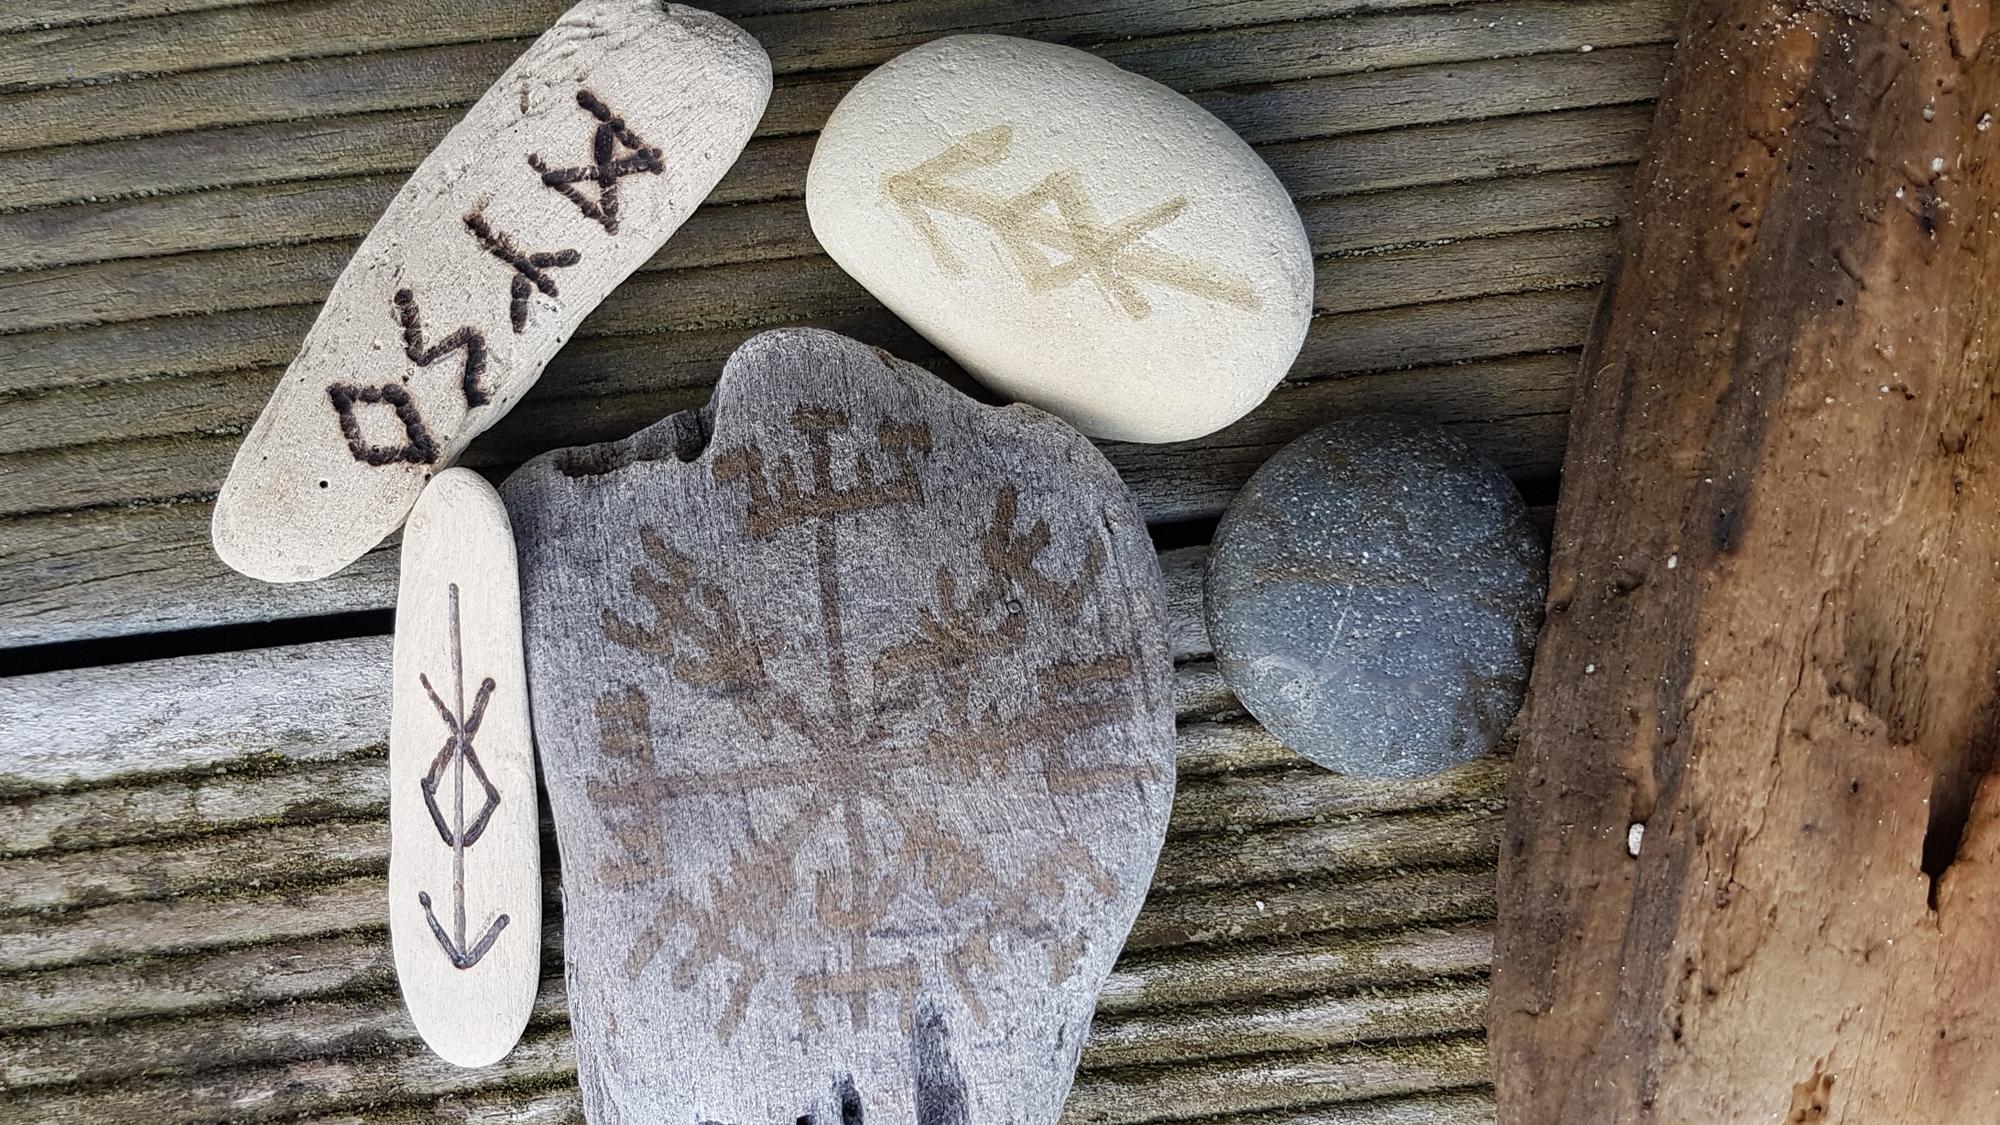 Stone and Wood Runes © Tracey Benson 2017